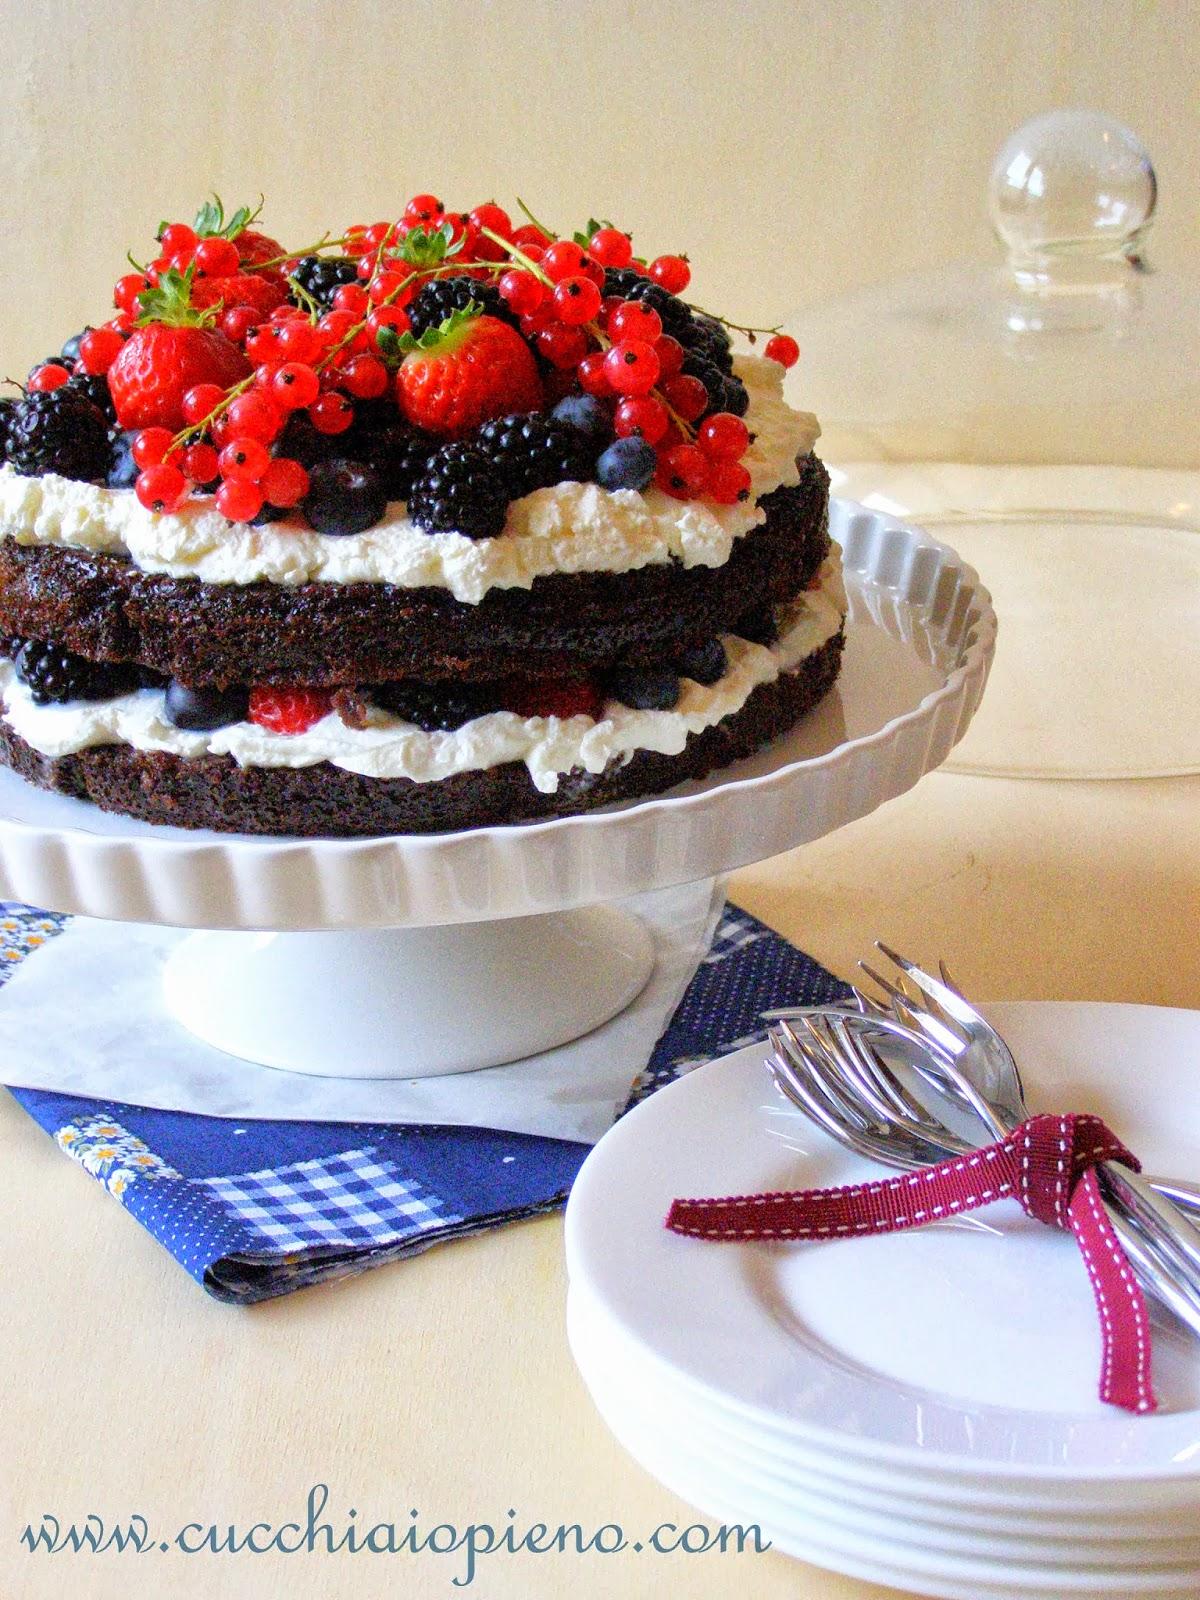 http://www.cucchiaiopieno.com/2013/10/bolo-de-aniversario-de-chocolate.html